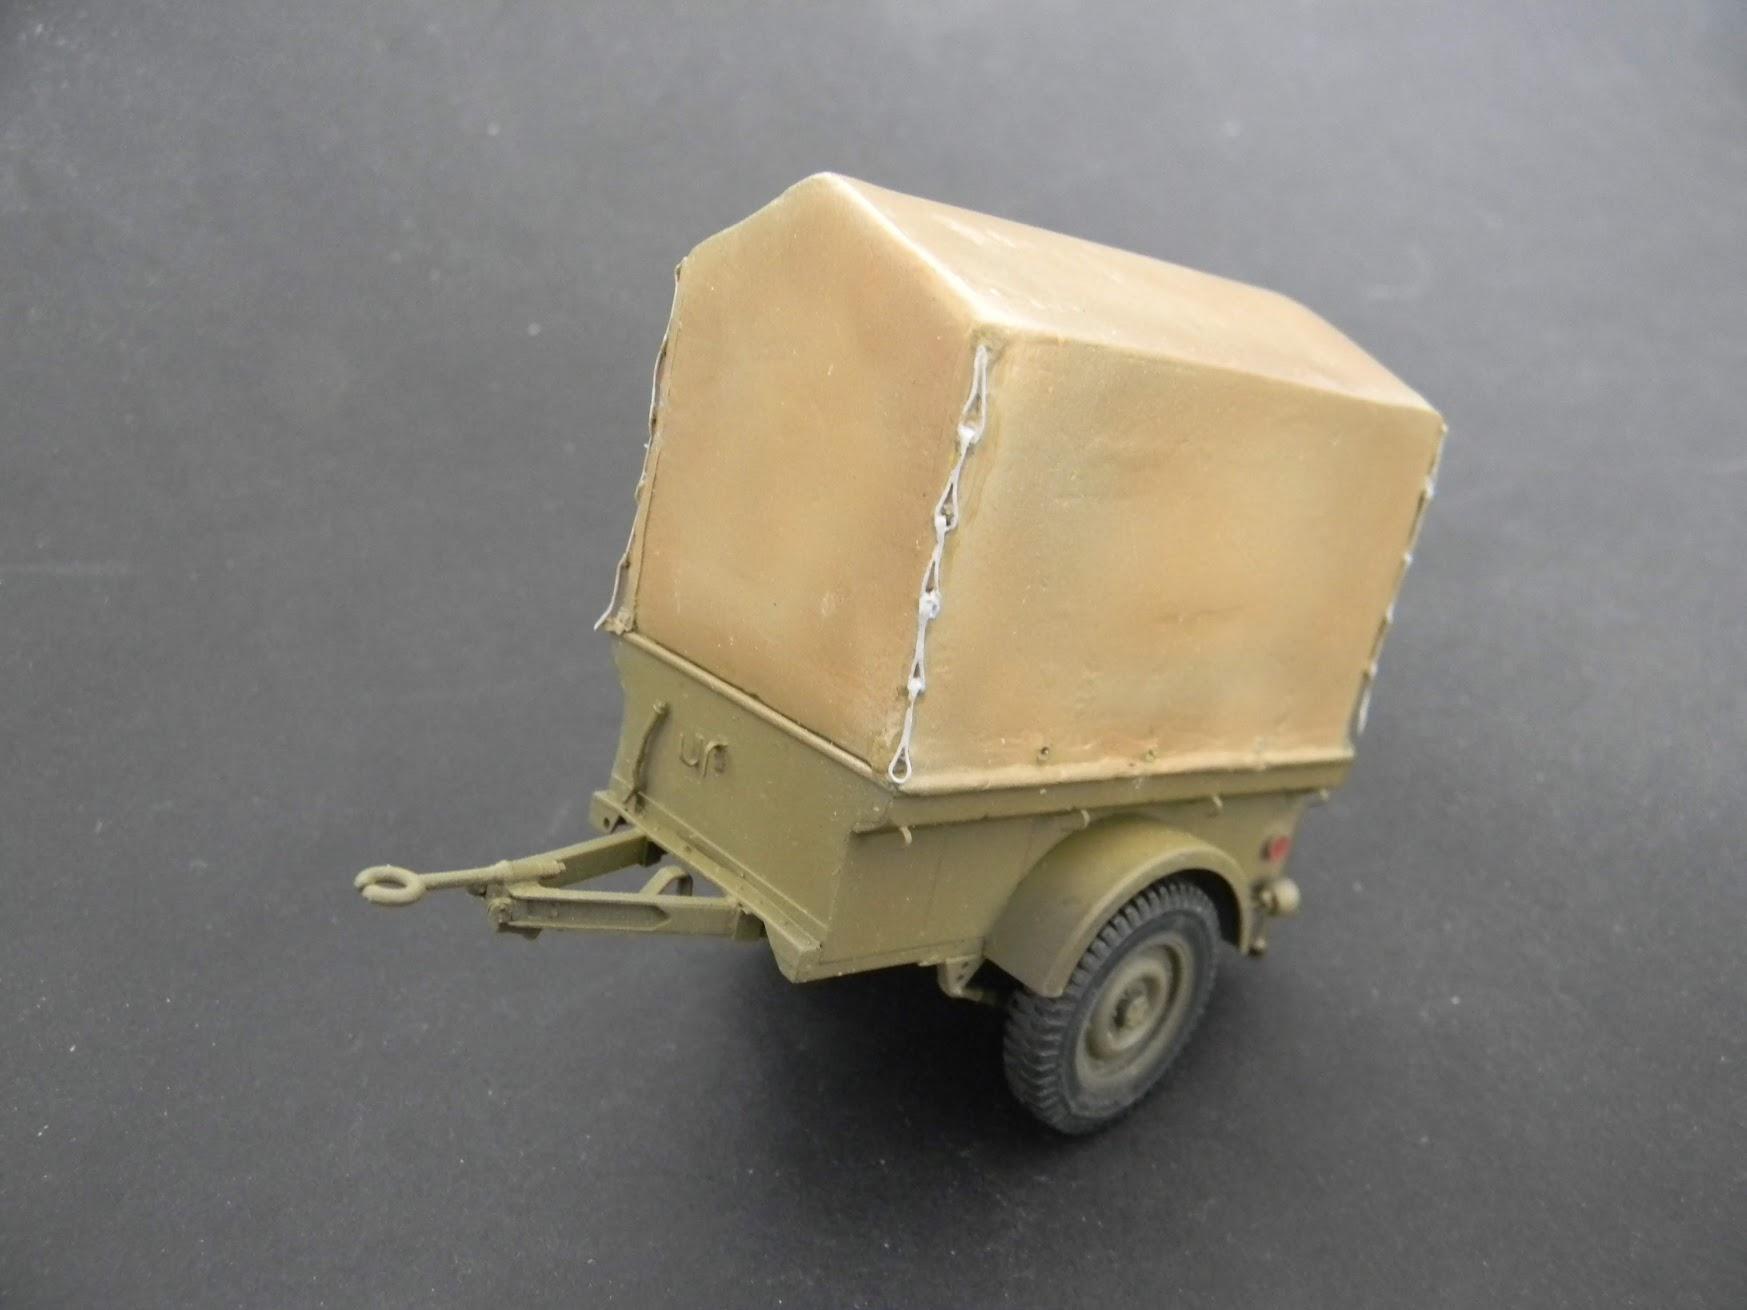 GPW 1942 Ford Bronco Model : revue de détail et montage - Page 5 XAeHktcLiCyrE9vrS8BZk2oLxjgdLPJ3mTtH5JRftXqeDVxAUR5hJChxks_s3f9M8ZmFe8-hWKFOqz2hMfZOeeM6rUPG5rrFcL21GK648WbYcWyrqBfxToSBUBJNMKdmQiMIbG0fP5Xh8jePVwj8EX_sQB6eFGr_zNIc6xAhV7P3mU0x4NEh8rhscaV4kXA_YX_UvjclEje5SgWekjF67oN9JEhWmgPfuXYneqxy0f7C1AJ6Vc1fF4N9MwiX9g5BCfYWLq1VpJKAu3HhryOrY0hqVWluxaLu6dlwatnN-qKNZ8Go02xiHXb0cnX_FaGkU1HMQn8X3Q4c0A4QPAzdd9L7W13uq5gF3TpYQHjaK7jImDZ4LtpnhrIJq4nC_M8Xsbeku4ZXNga26On6x702TzGAjXNMpy9JXGE0C6T0lnidJ4fME367LbHXJT3azveQ00-OXHSNsU1IM_569aFMEtbWQJyGmvrohy79Bb3kUfMoMnGfYulEeC-IFOELIJEss5fd0dbVH8nlXb8TyId_QOGVAUY09kLDy3KaD1fjY_Nznj24u74mIuhdQcXPKiKqqf21Q1dcI2Rk70n08kIX9CX0mtcNcaWprCqeXSkvpeD7rbJrO5qD2gJa-49ziYB_LncdhT_ecDj0PLODg76oUHtCnu1qir7DLavhvYq-GUunrtowkvTQe3FriX4IU7gtM-85IxJ2_aYU_Gu2kJNWNW4vQZSW9b8H4fT5VN3a4WZBbBIJDw=w1747-h1310-no